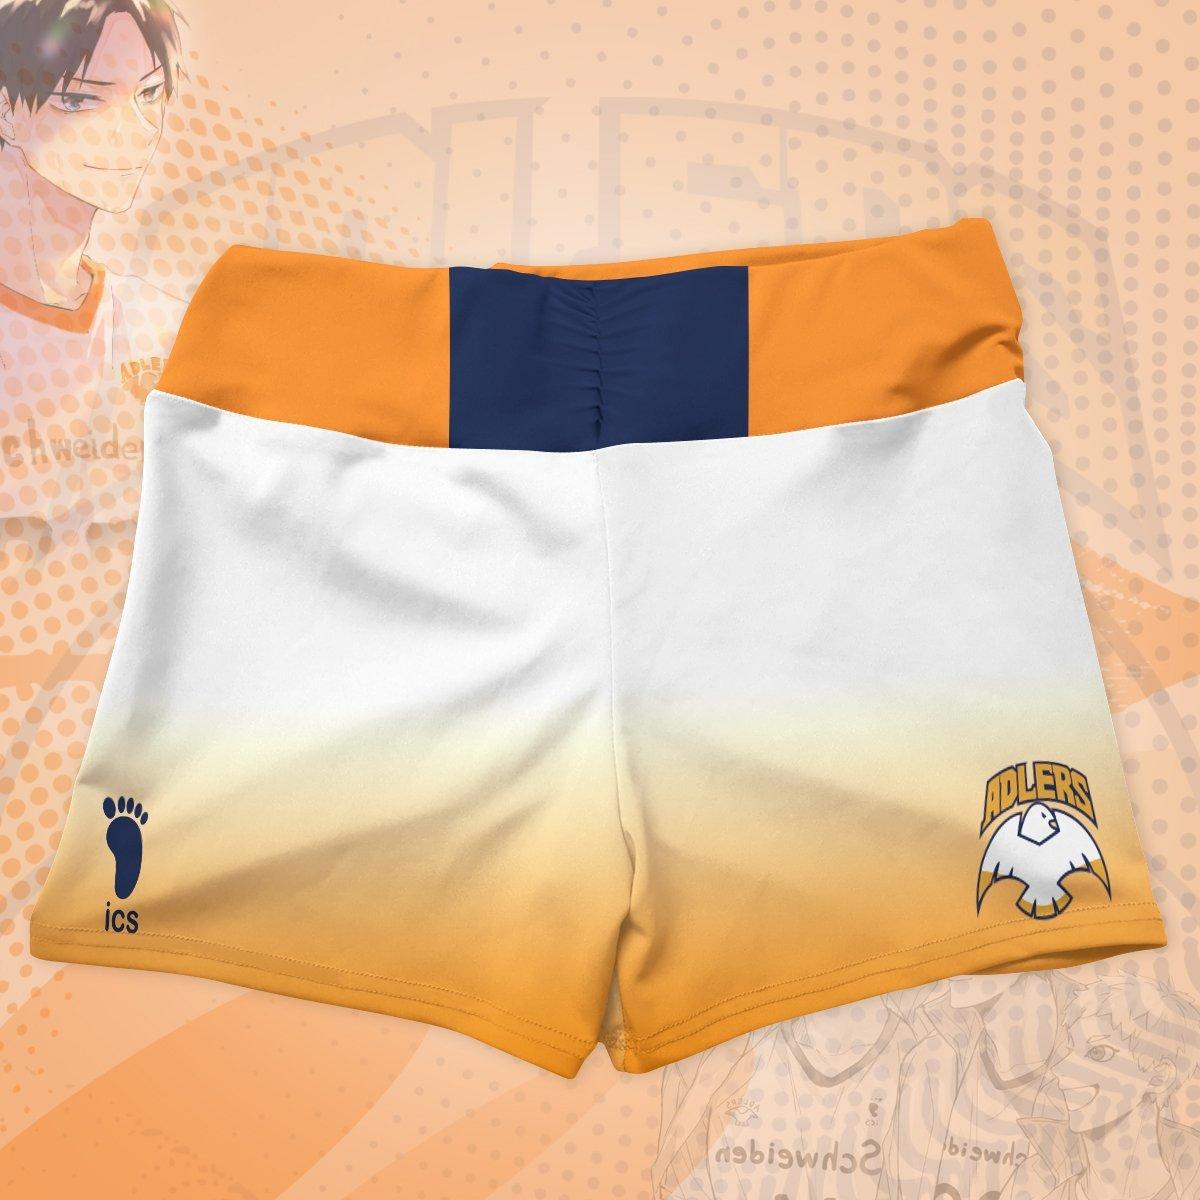 schweiden adlers active wear set 198471 - Anime Swimsuits